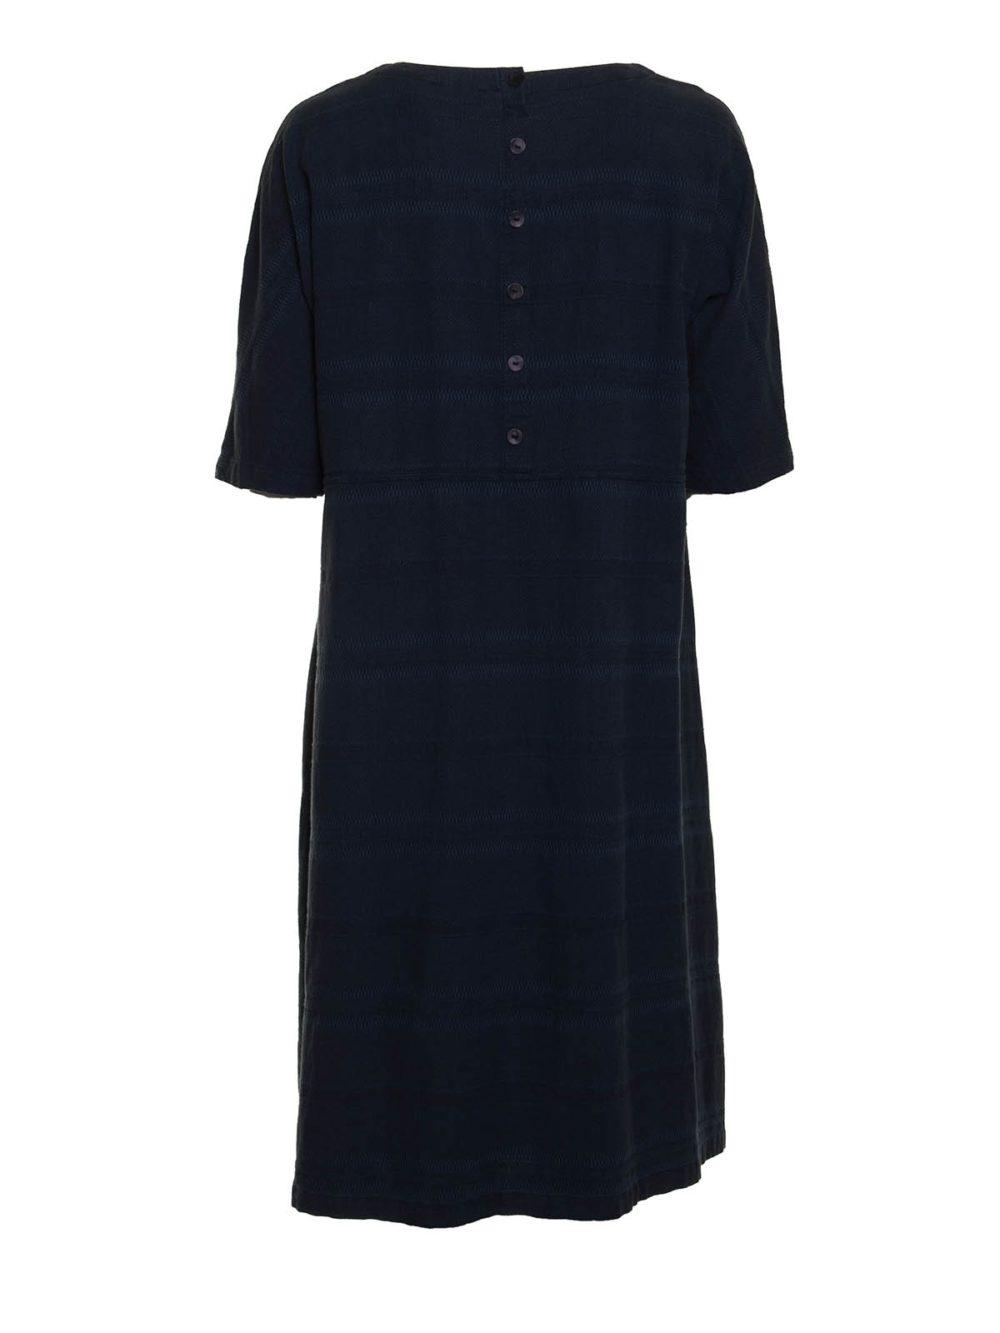 Denim Textured Stripe Dress Sahara Katie Kerr Women's Clothing